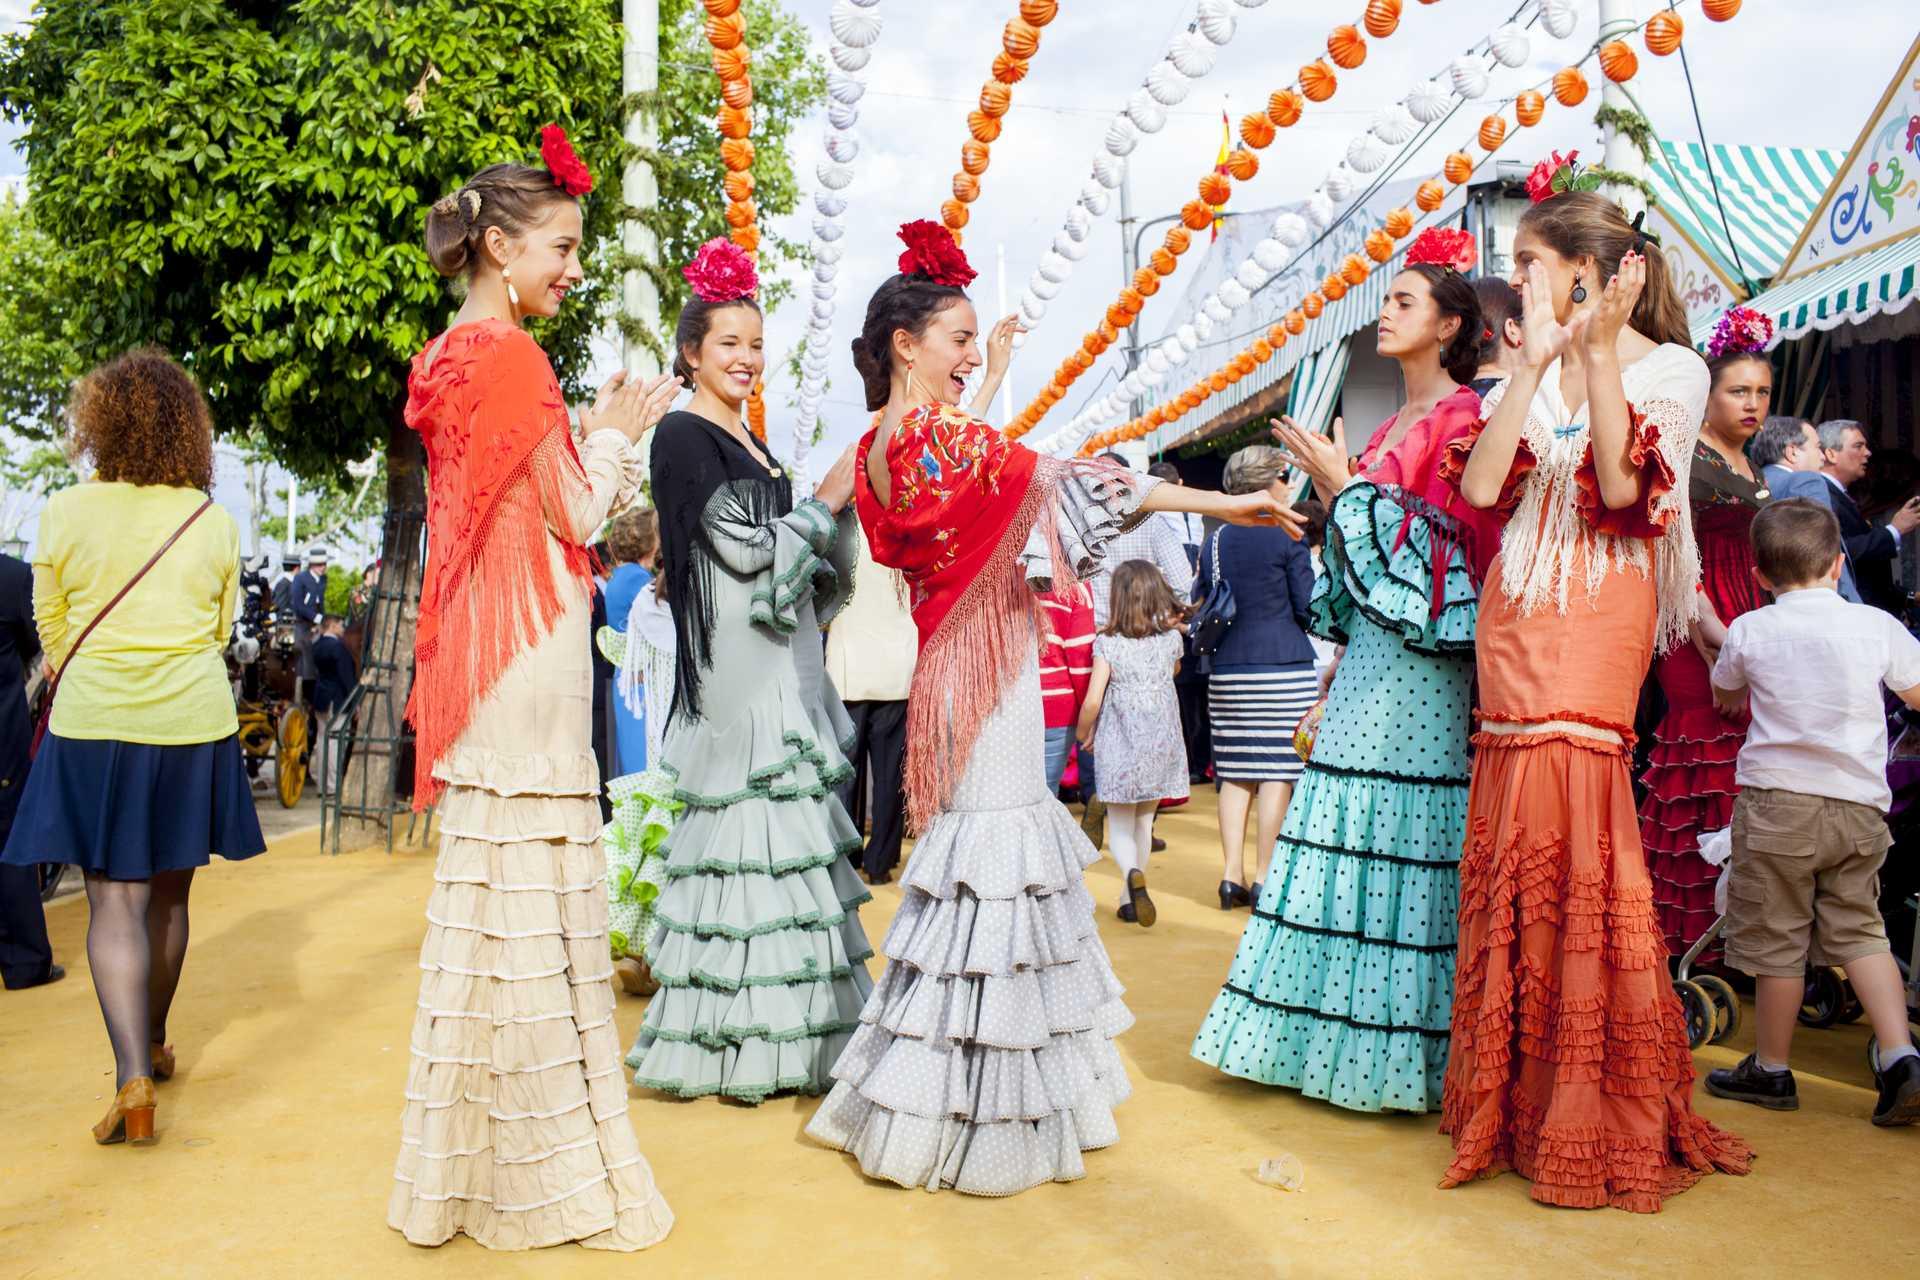 More Carnivals of tourist interest